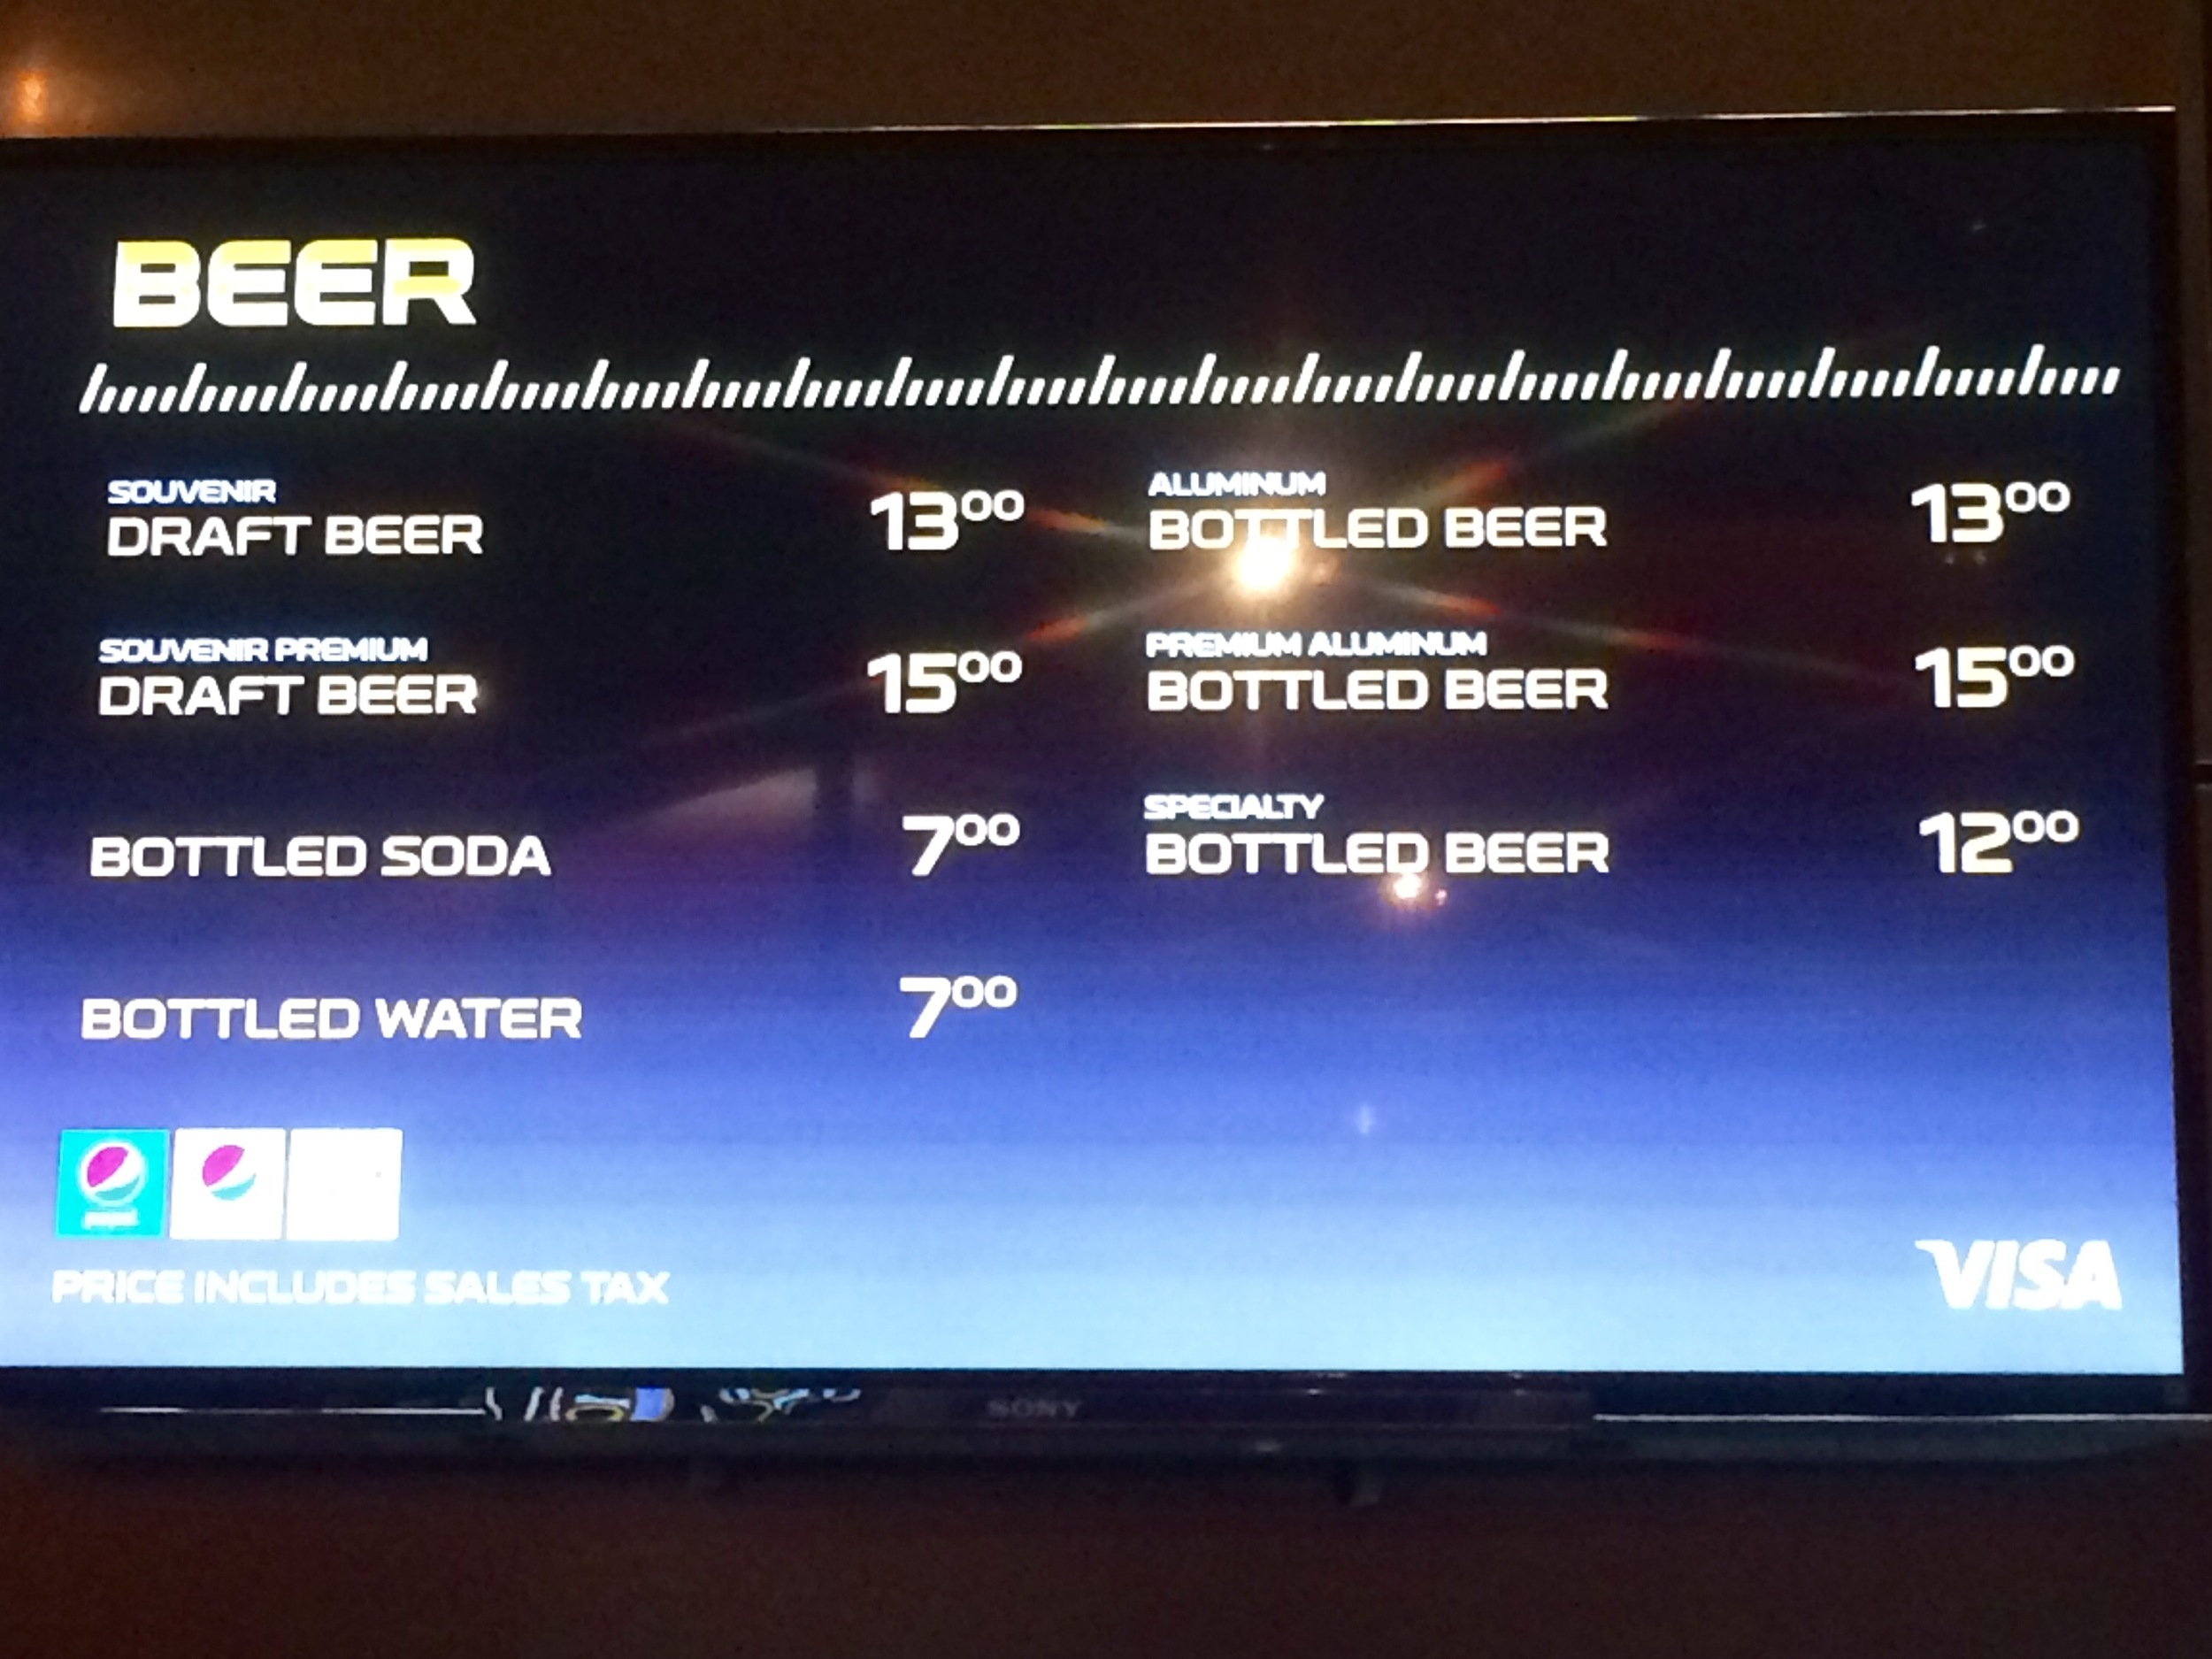 Bottle or draft beer?